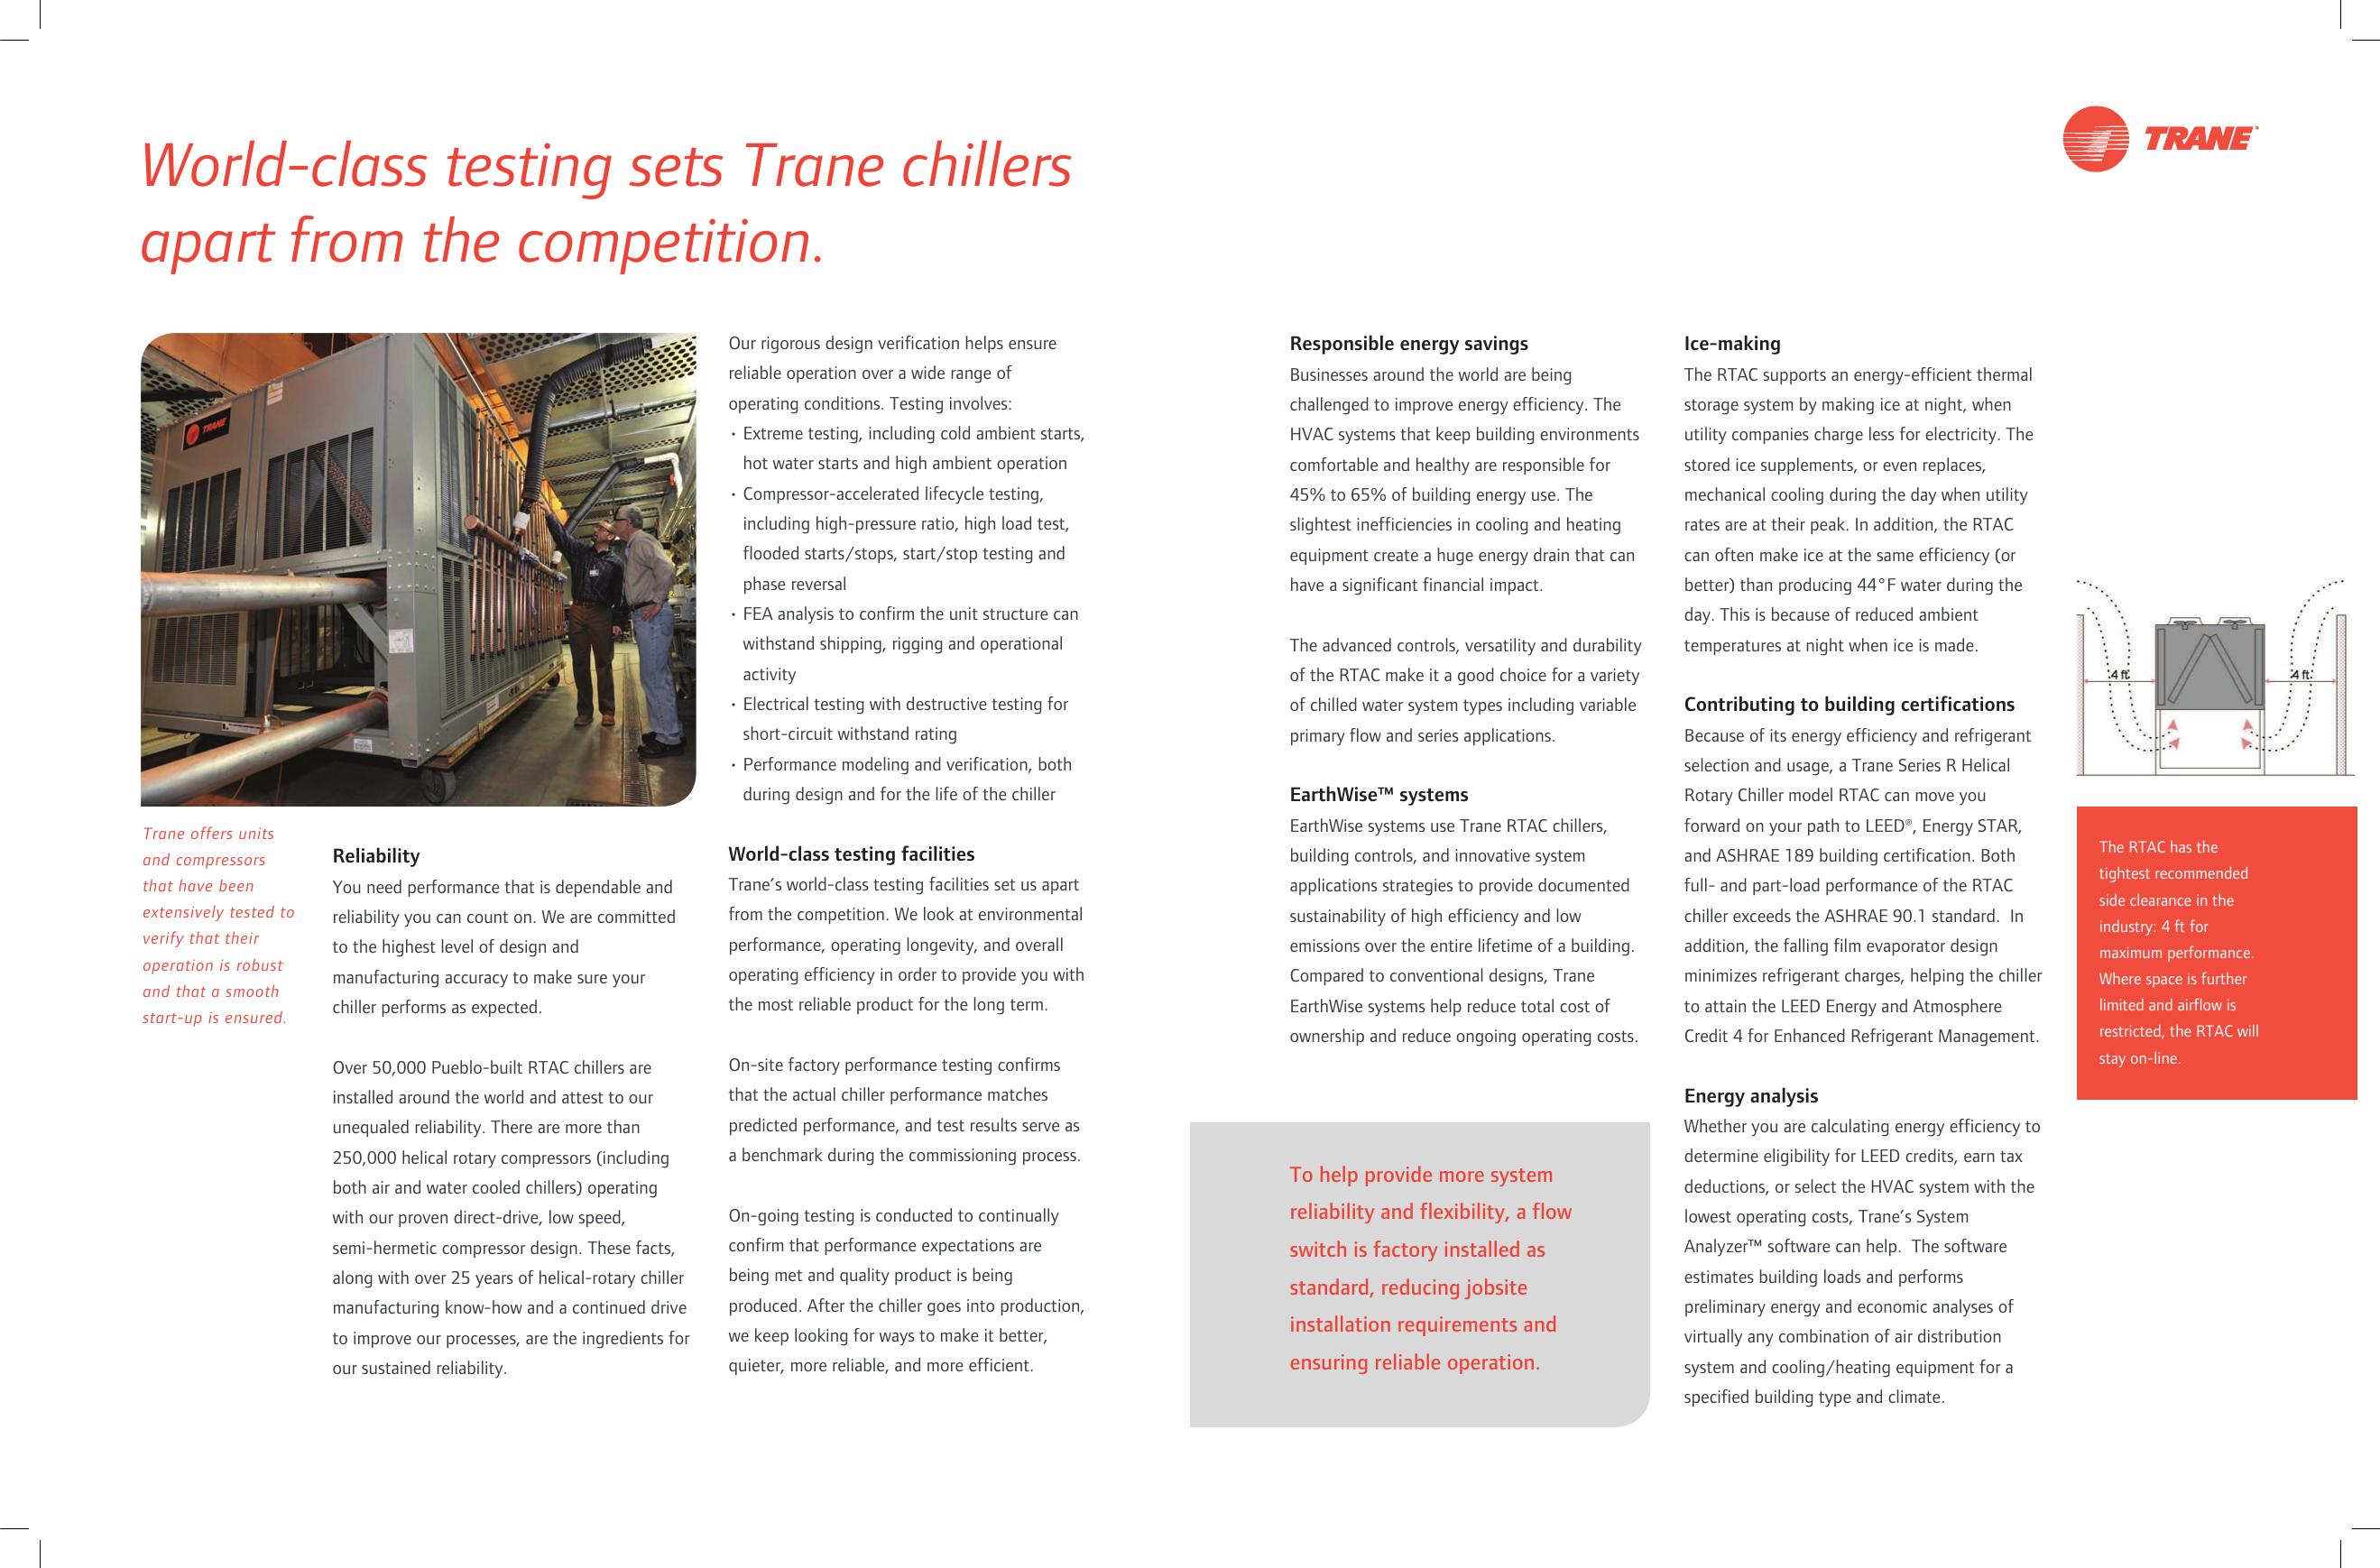 Trane Series R Helical Rotary Rtac Brochure RLC SLB003 EN 10